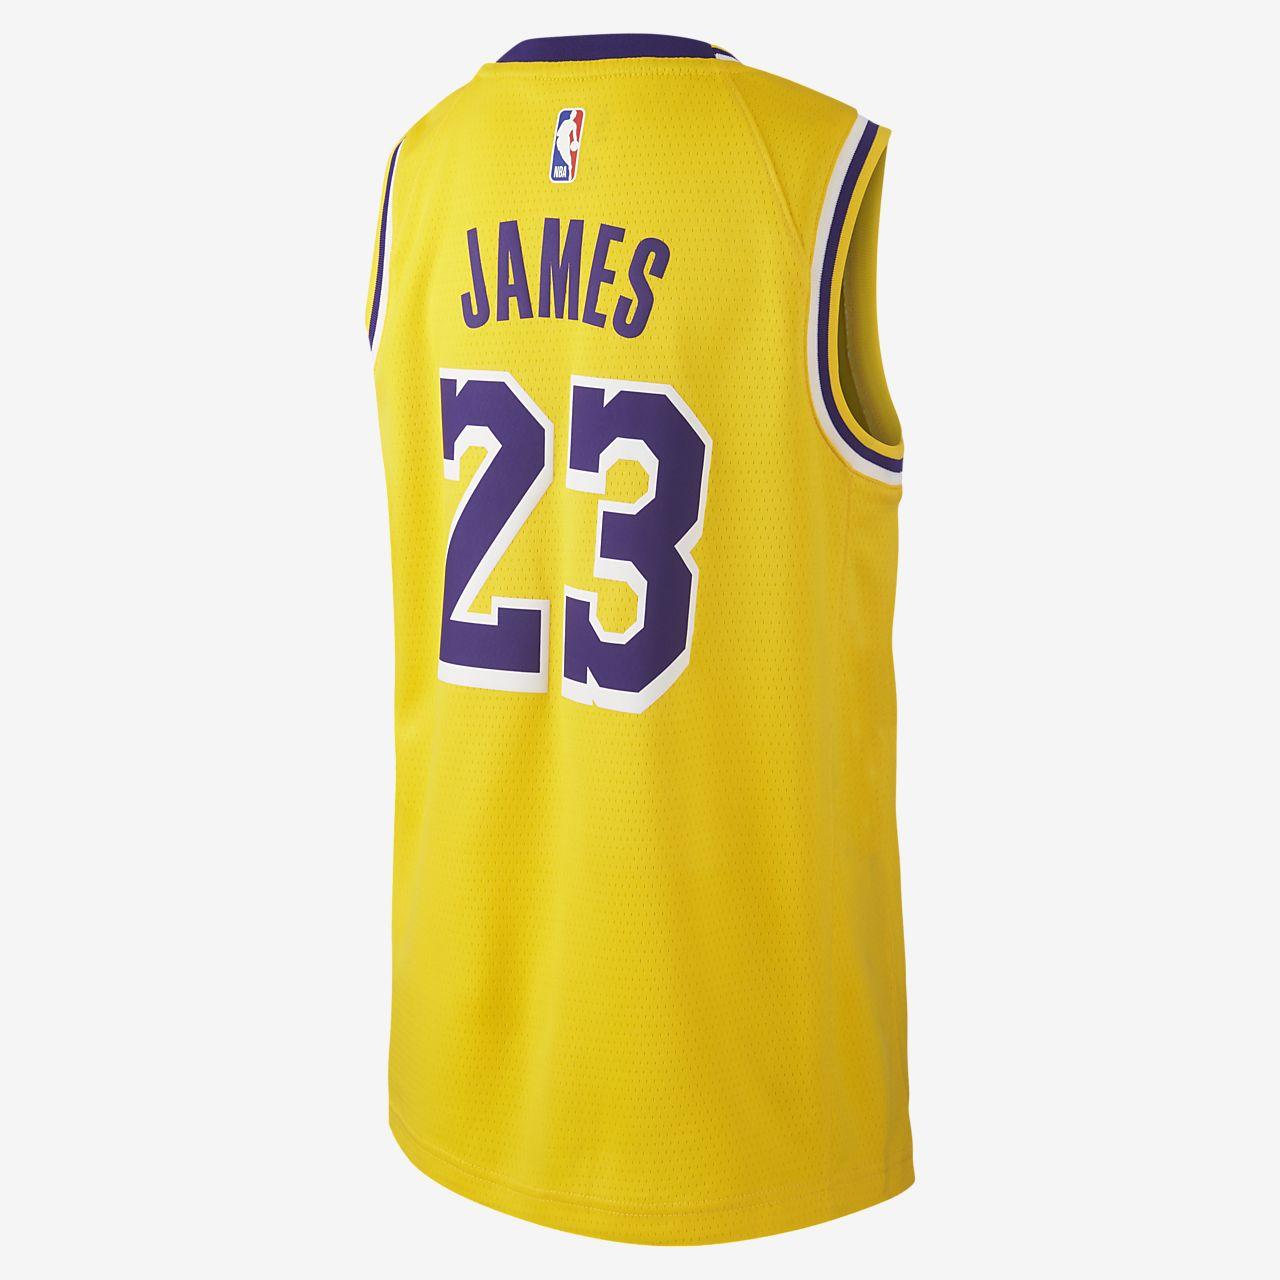 c58d640ec18d ... LeBron James Los Angeles Lakers Nike Icon Edition Swingman NBA-Trikot  für ältere Kinder